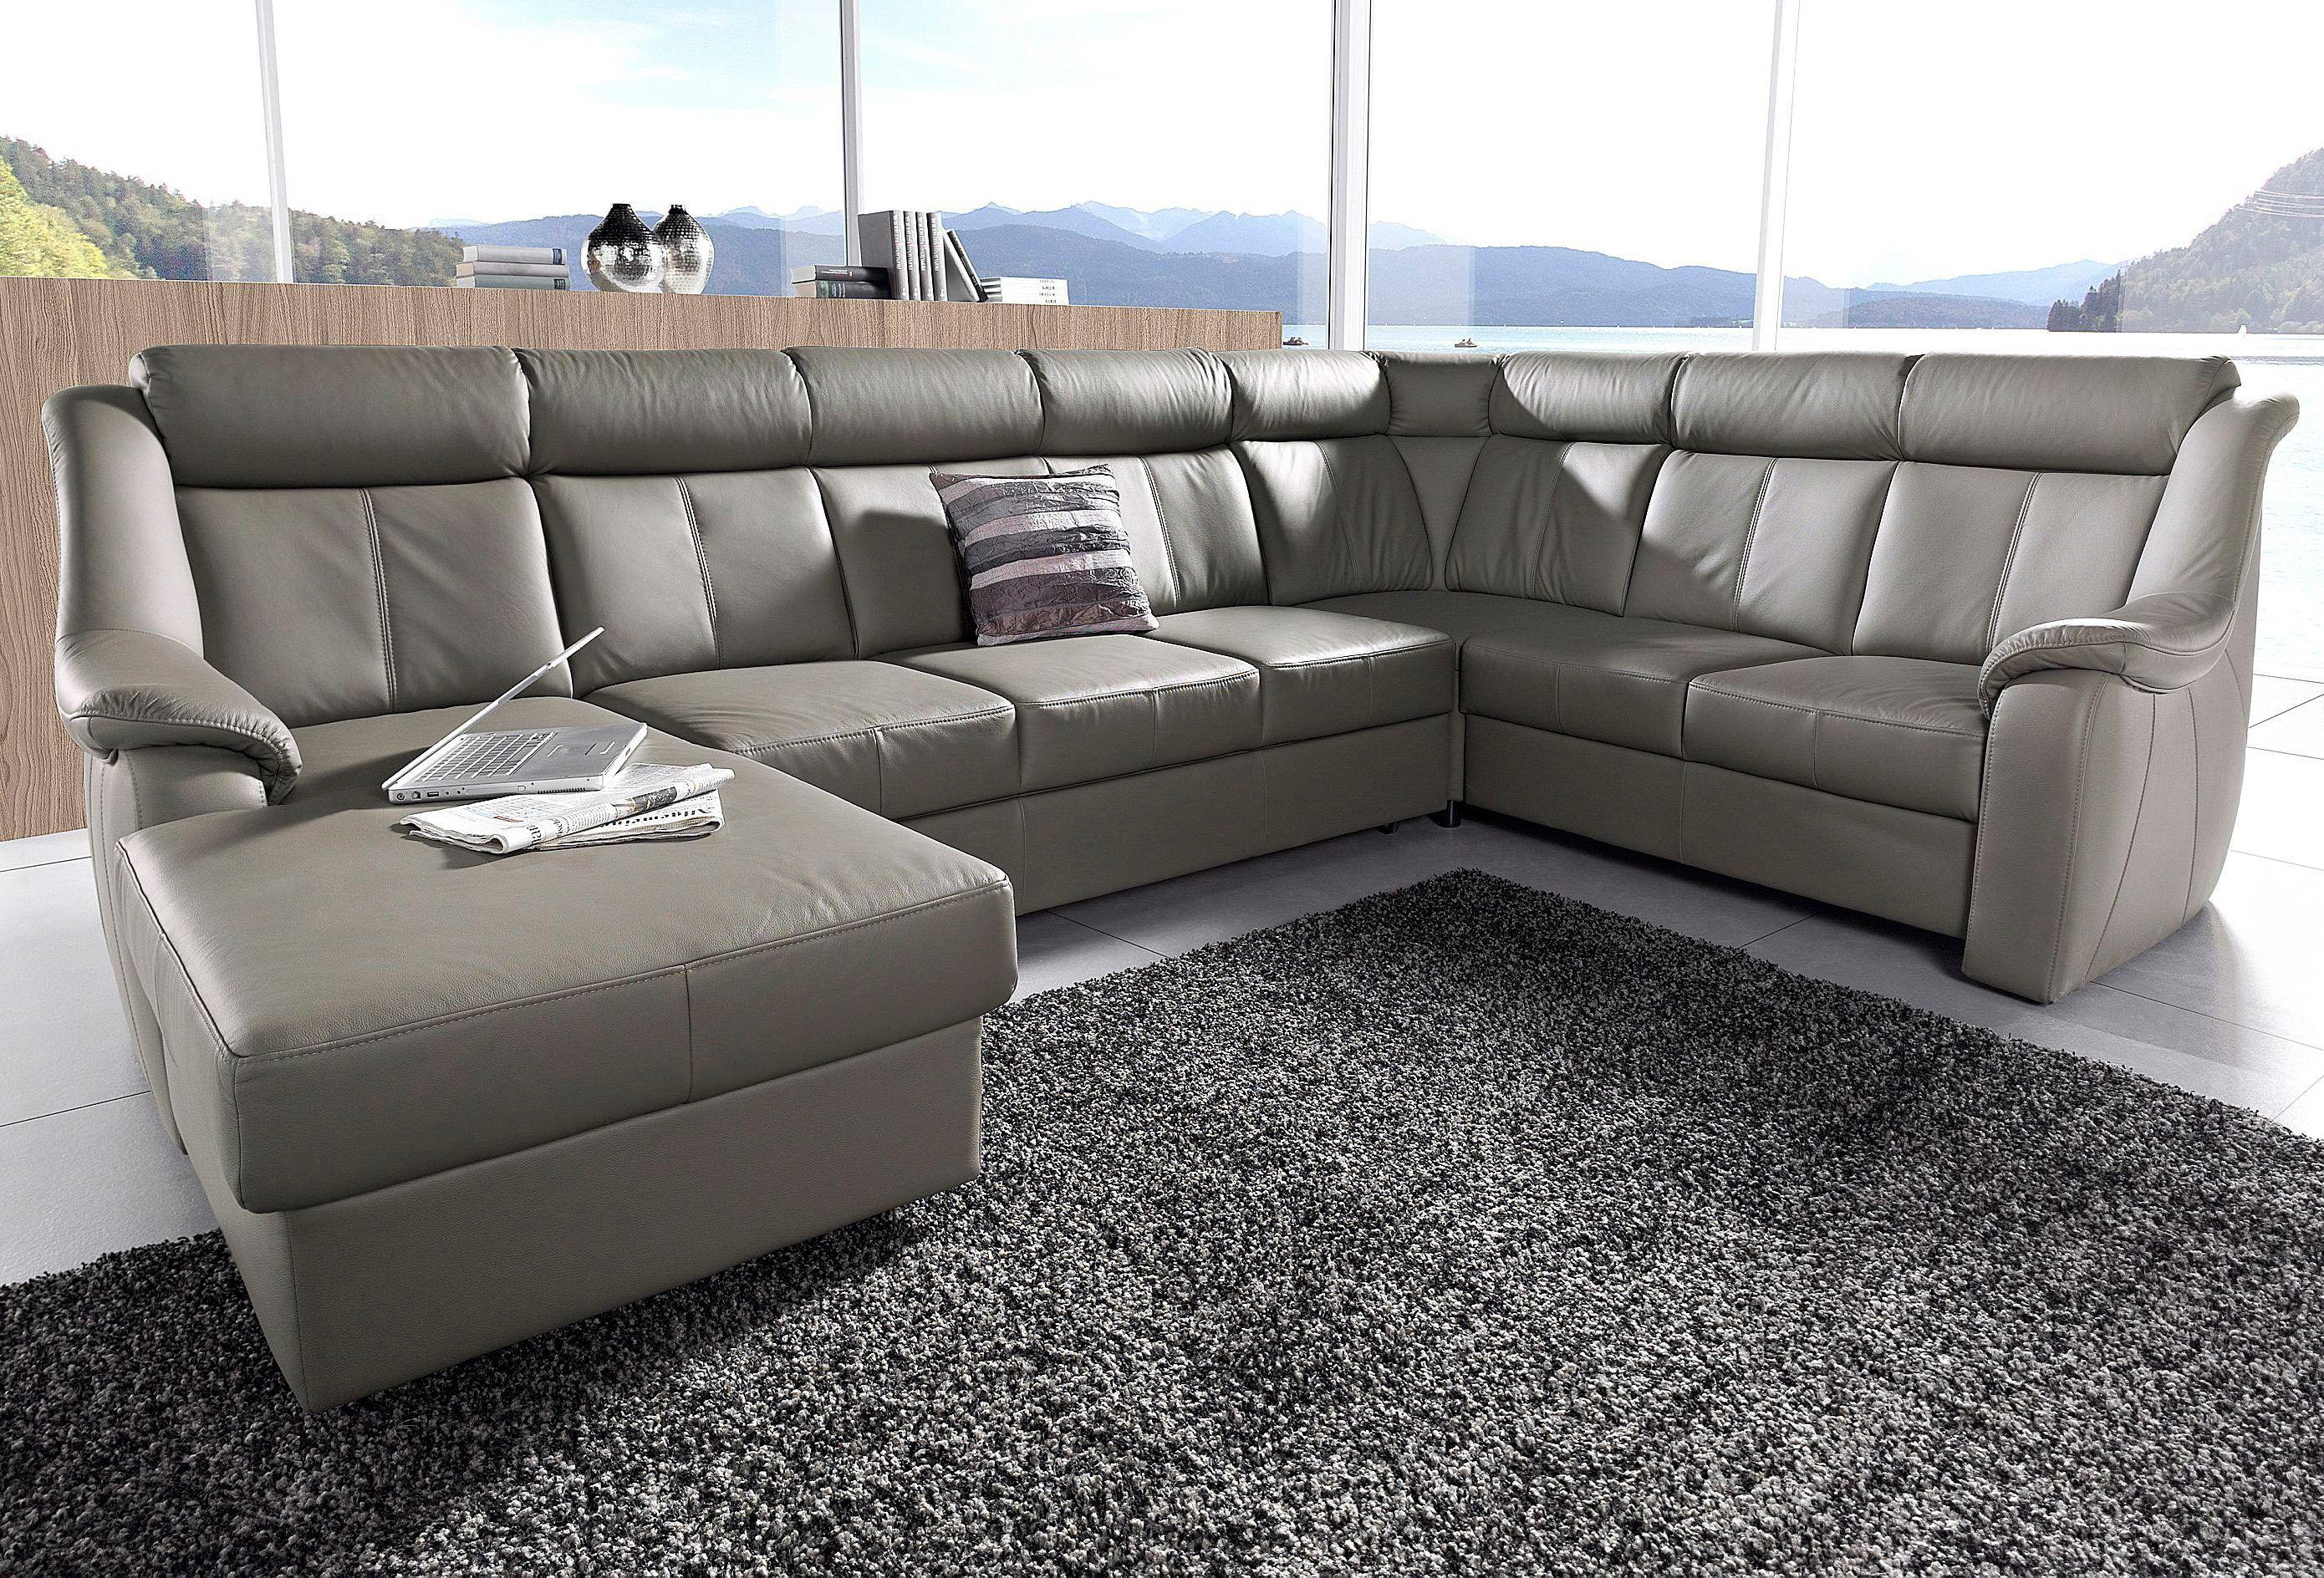 Bemerkenswert Couch Relaxfunktion Foto Von Wohnlandschaft Grau, Mit Relaxfunktion, Recamiere Links, Fsc®-zertifiziert,